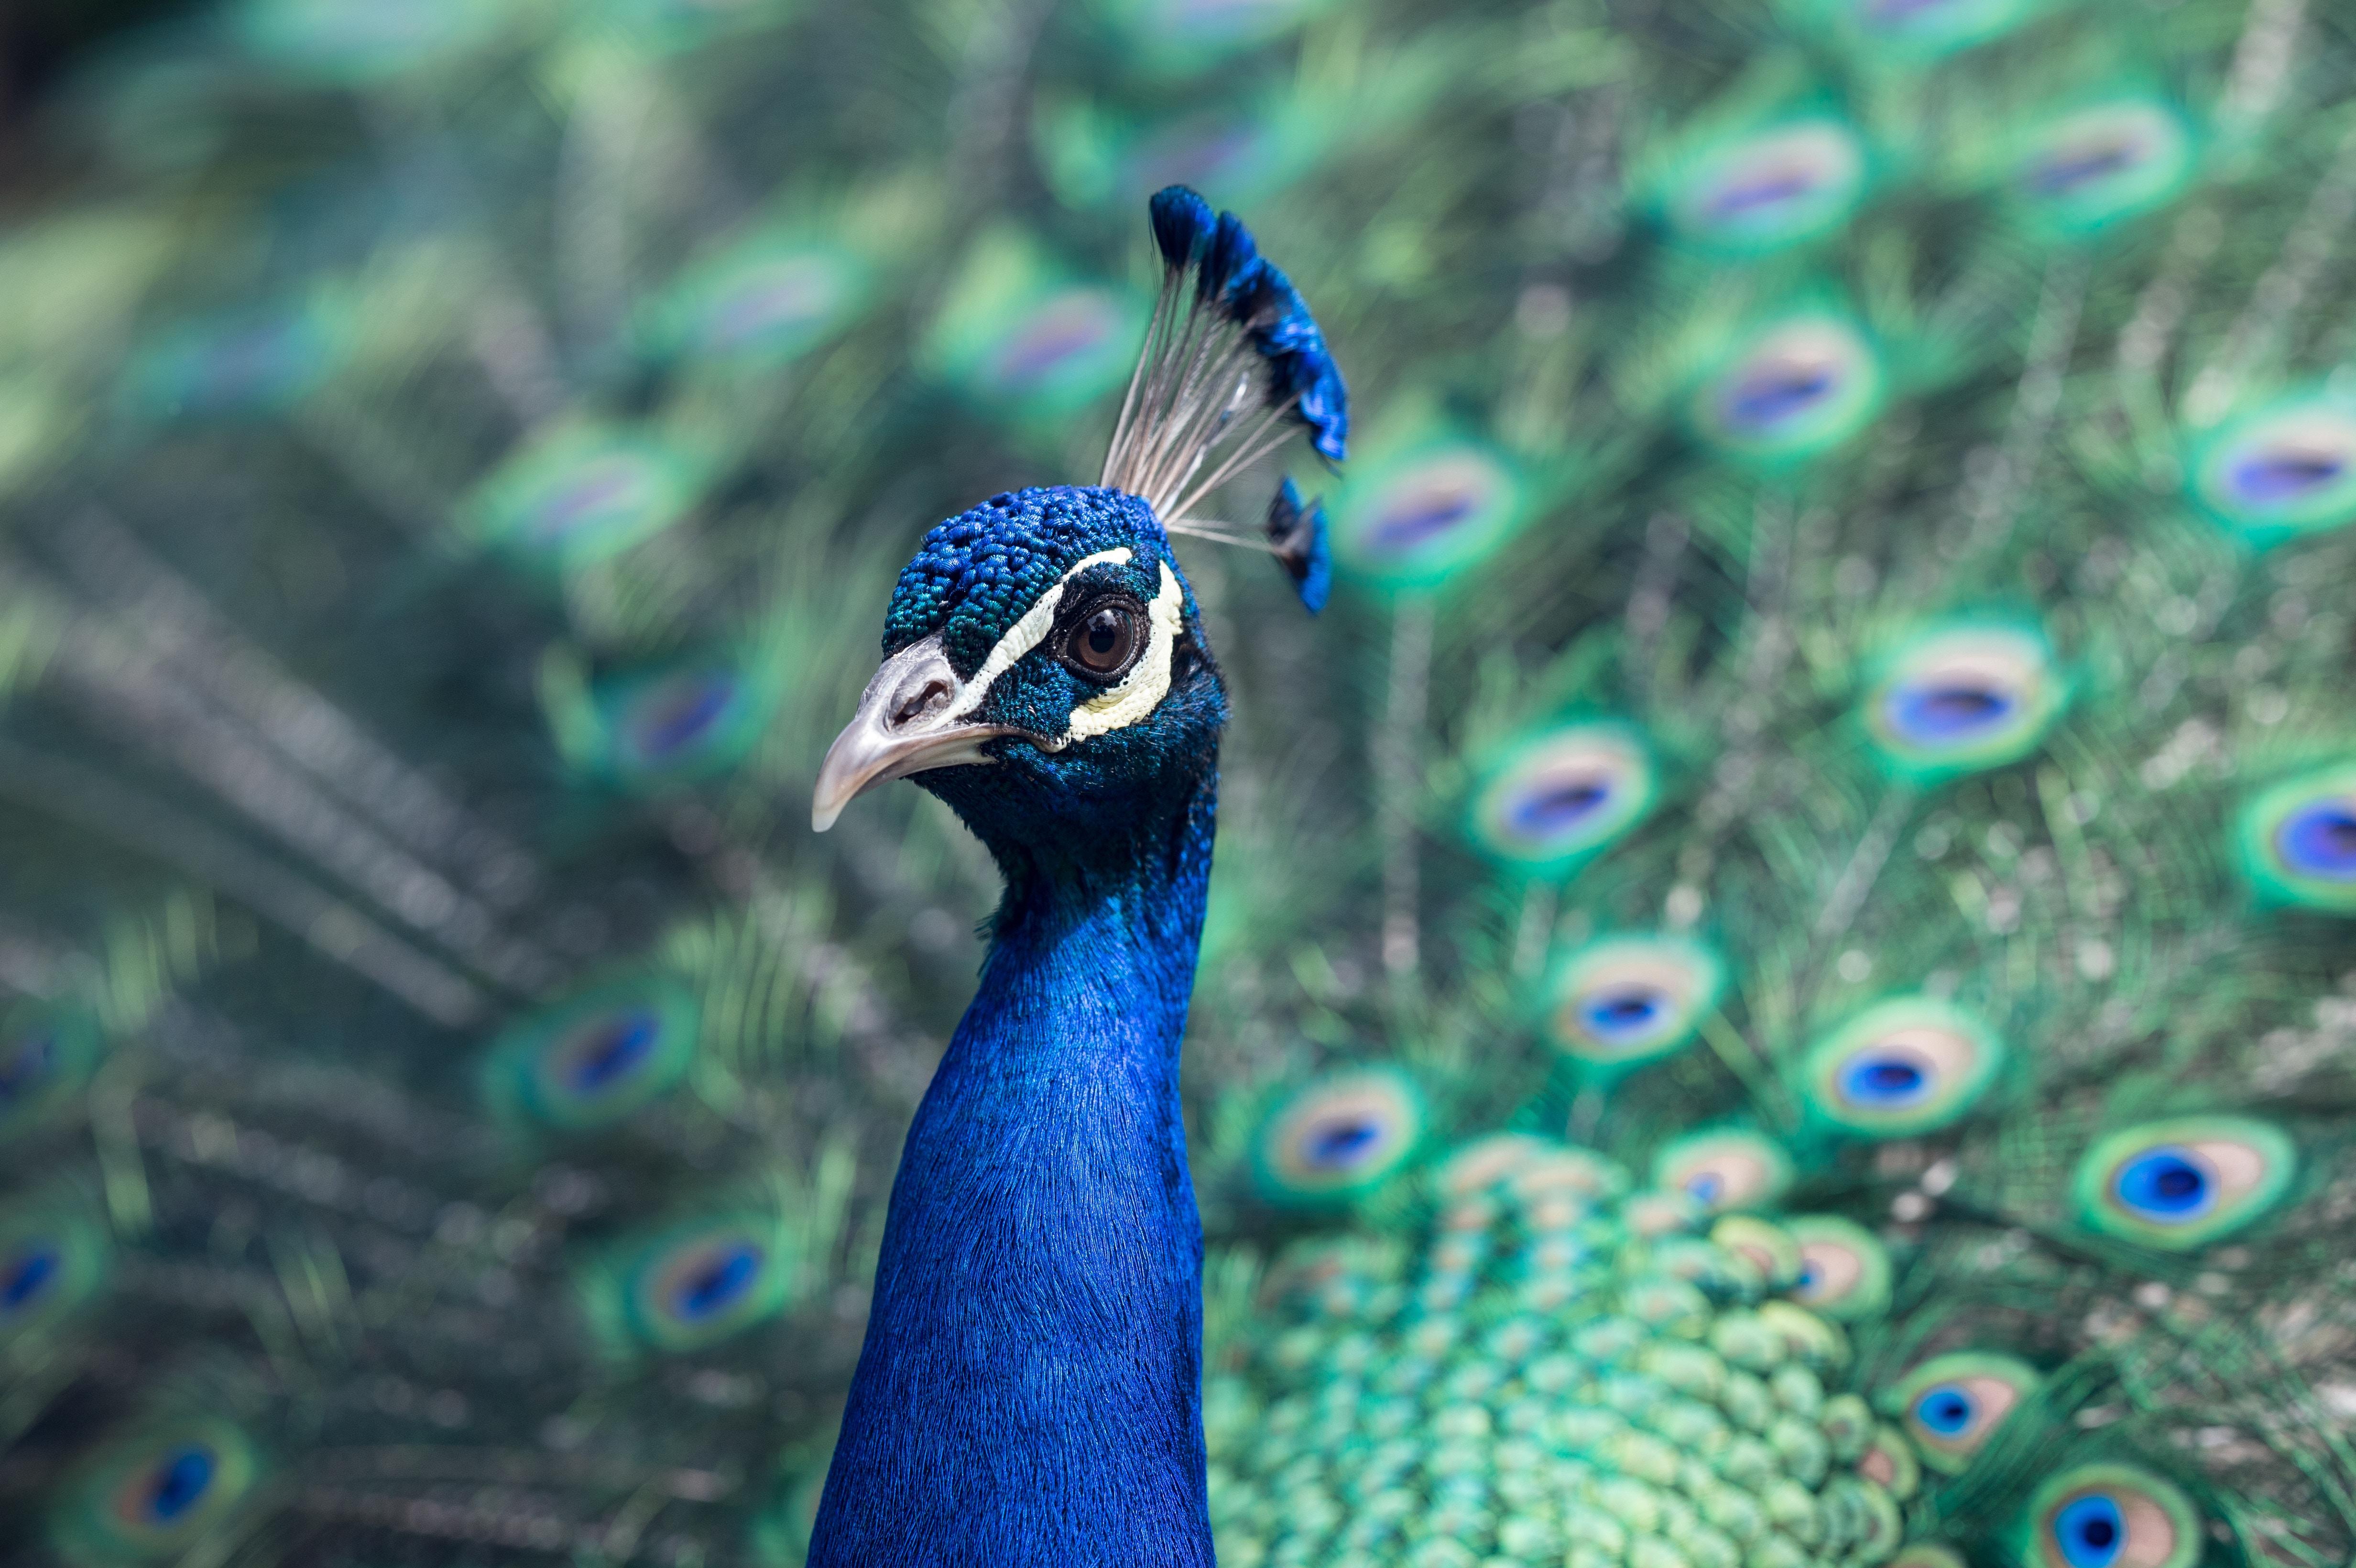 peacock photo by Tj Holowaychuk on Unsplash